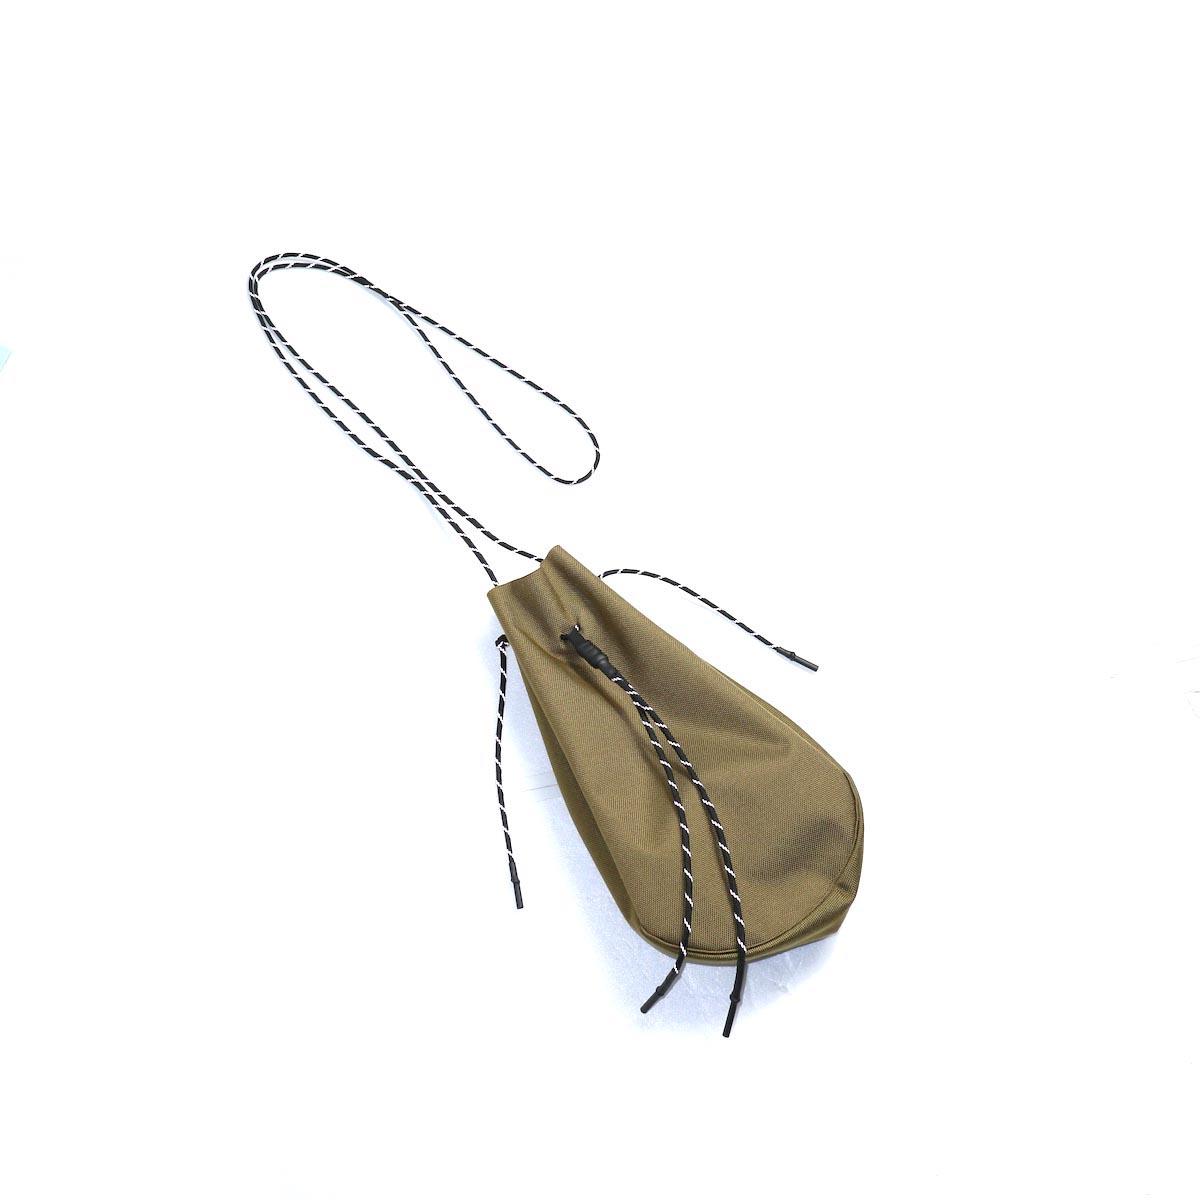 吉岡衣料店 / drawstring bag -L-. (Coyote)